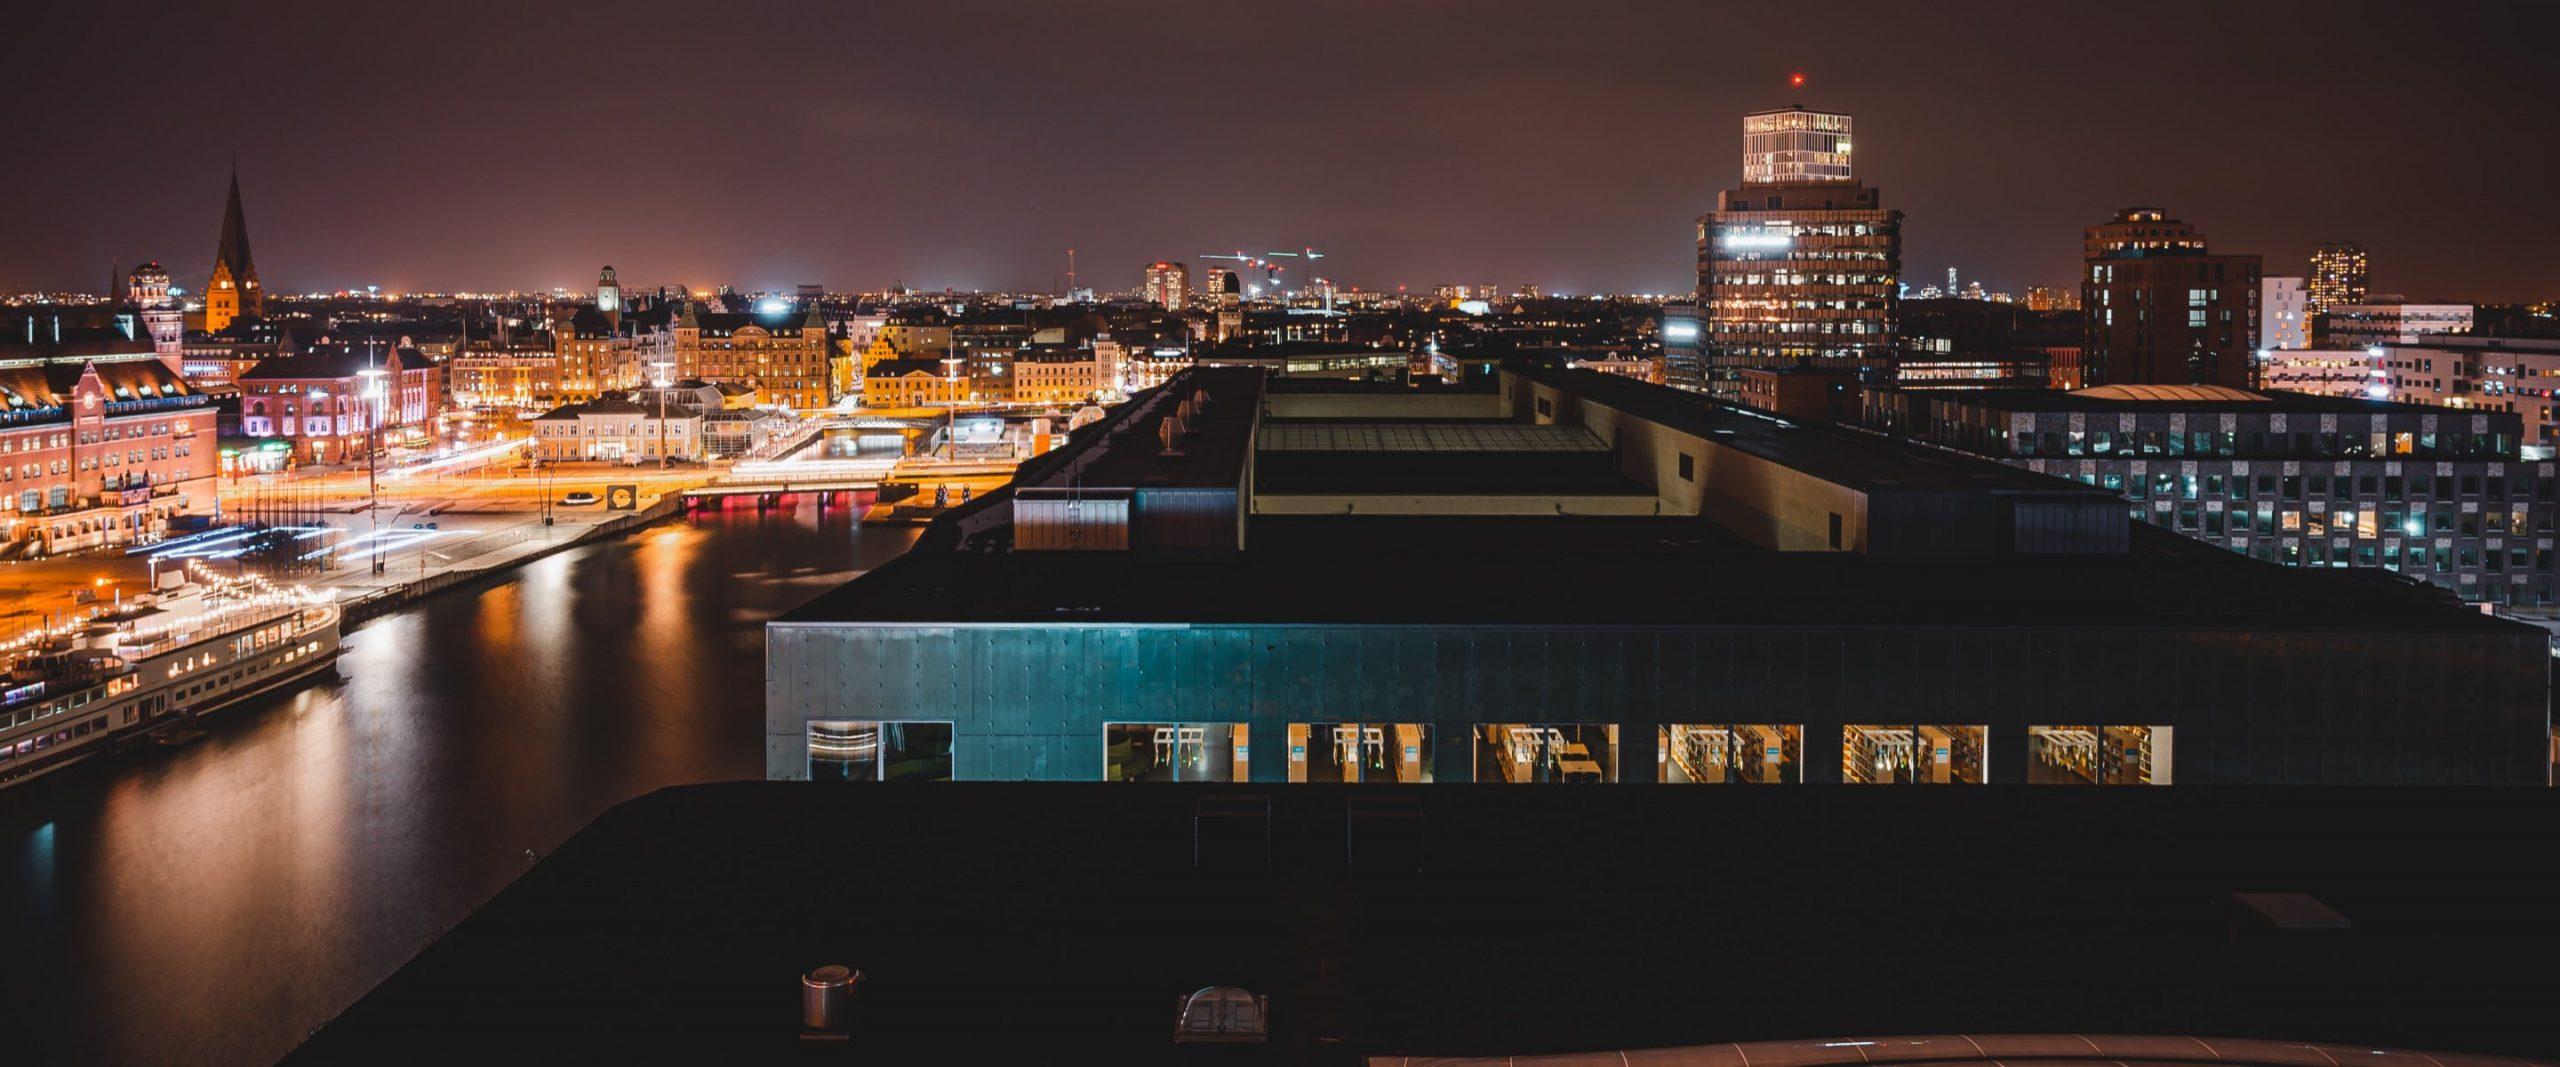 Stadsljus som lyser i mörker